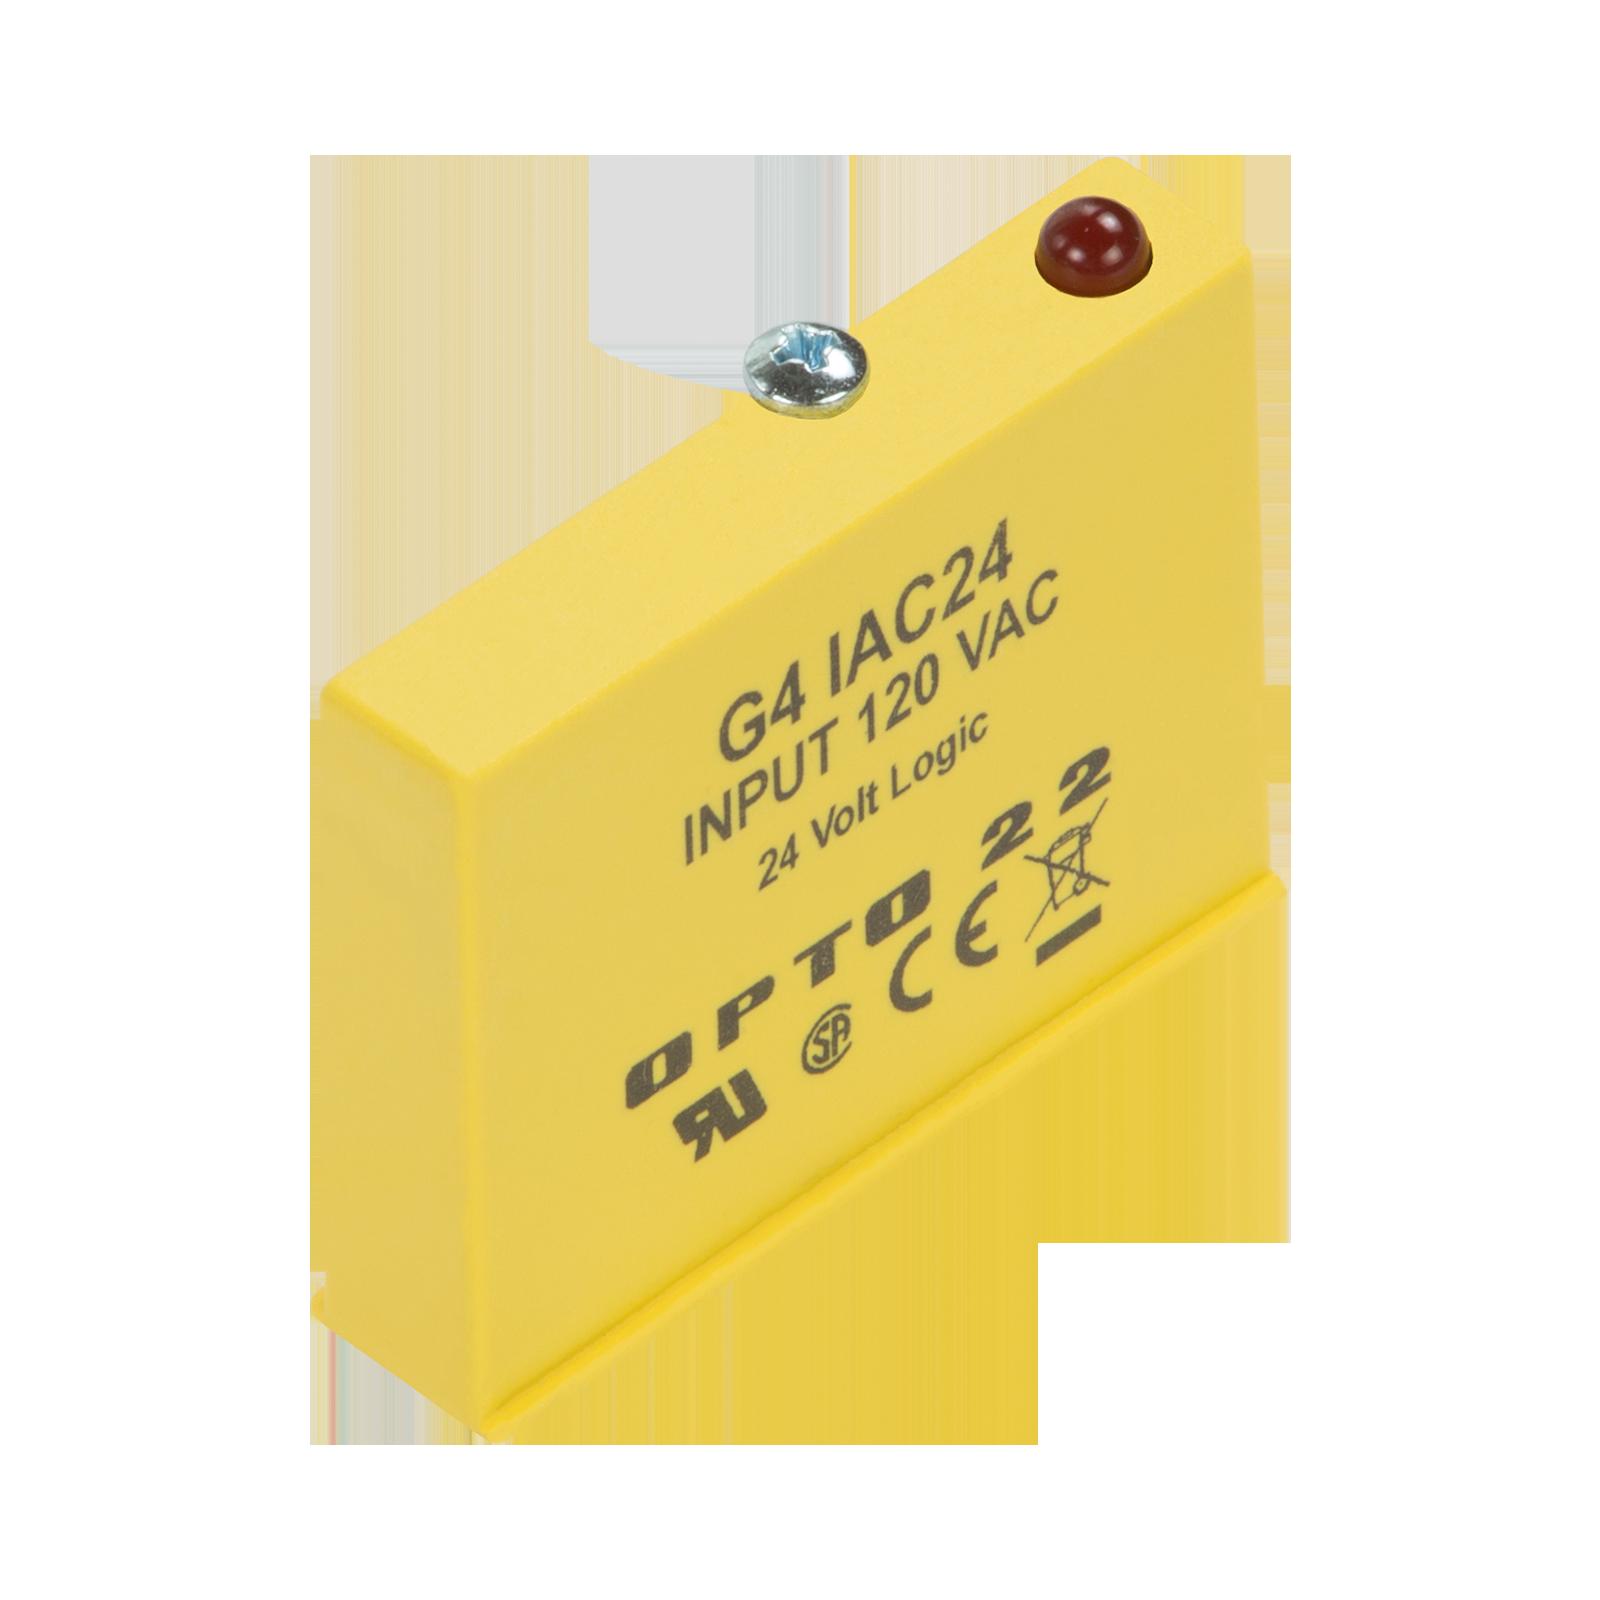 opto22 g4iac24 g4 ac input 90 140 vac vdc 24 vdc logic rh opto22 com